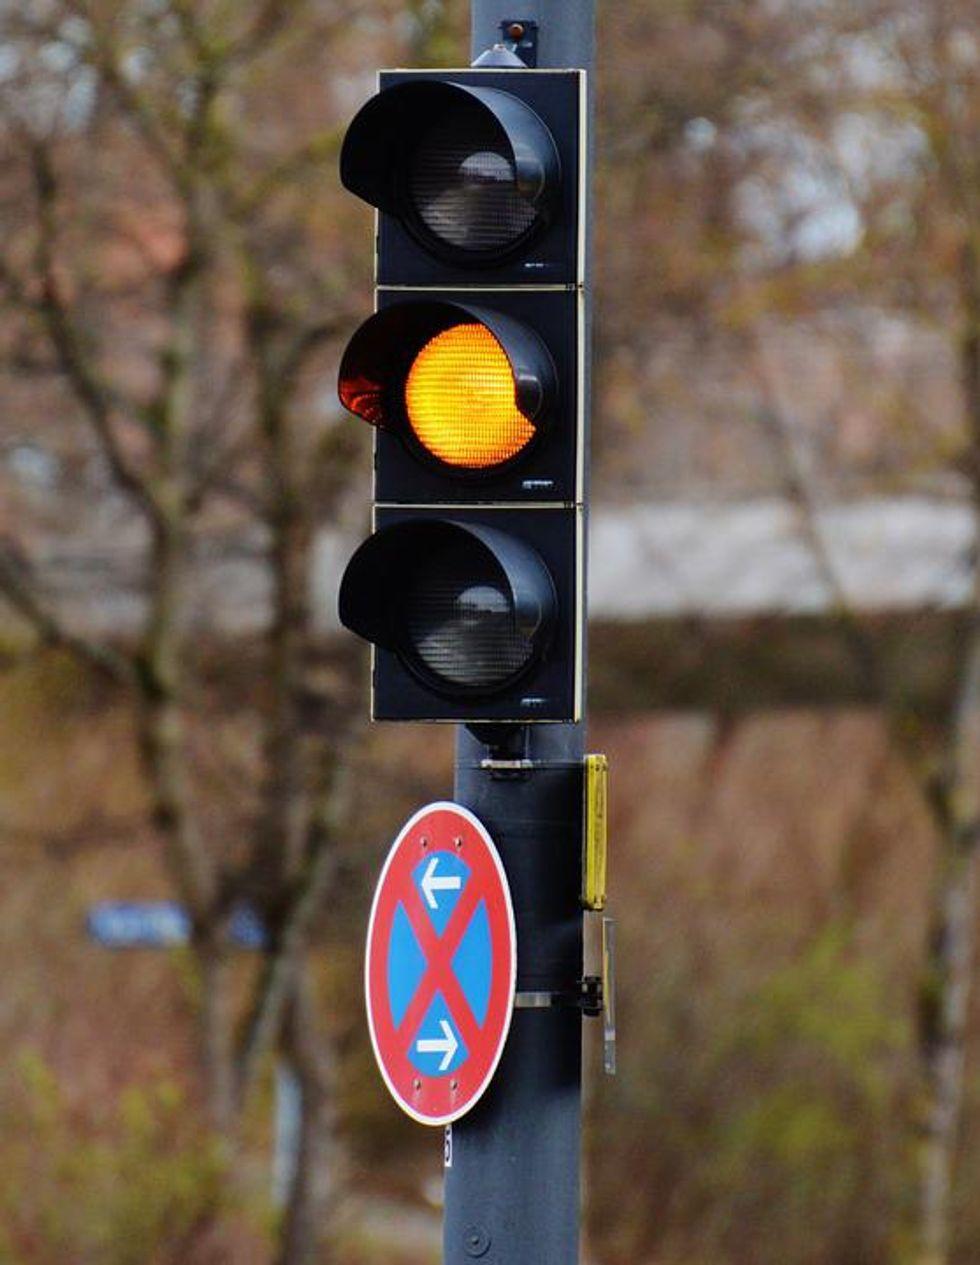 https://www.maxpixel.net/Road-Traffic-Lights-Yellow-Light-Signal-1286799